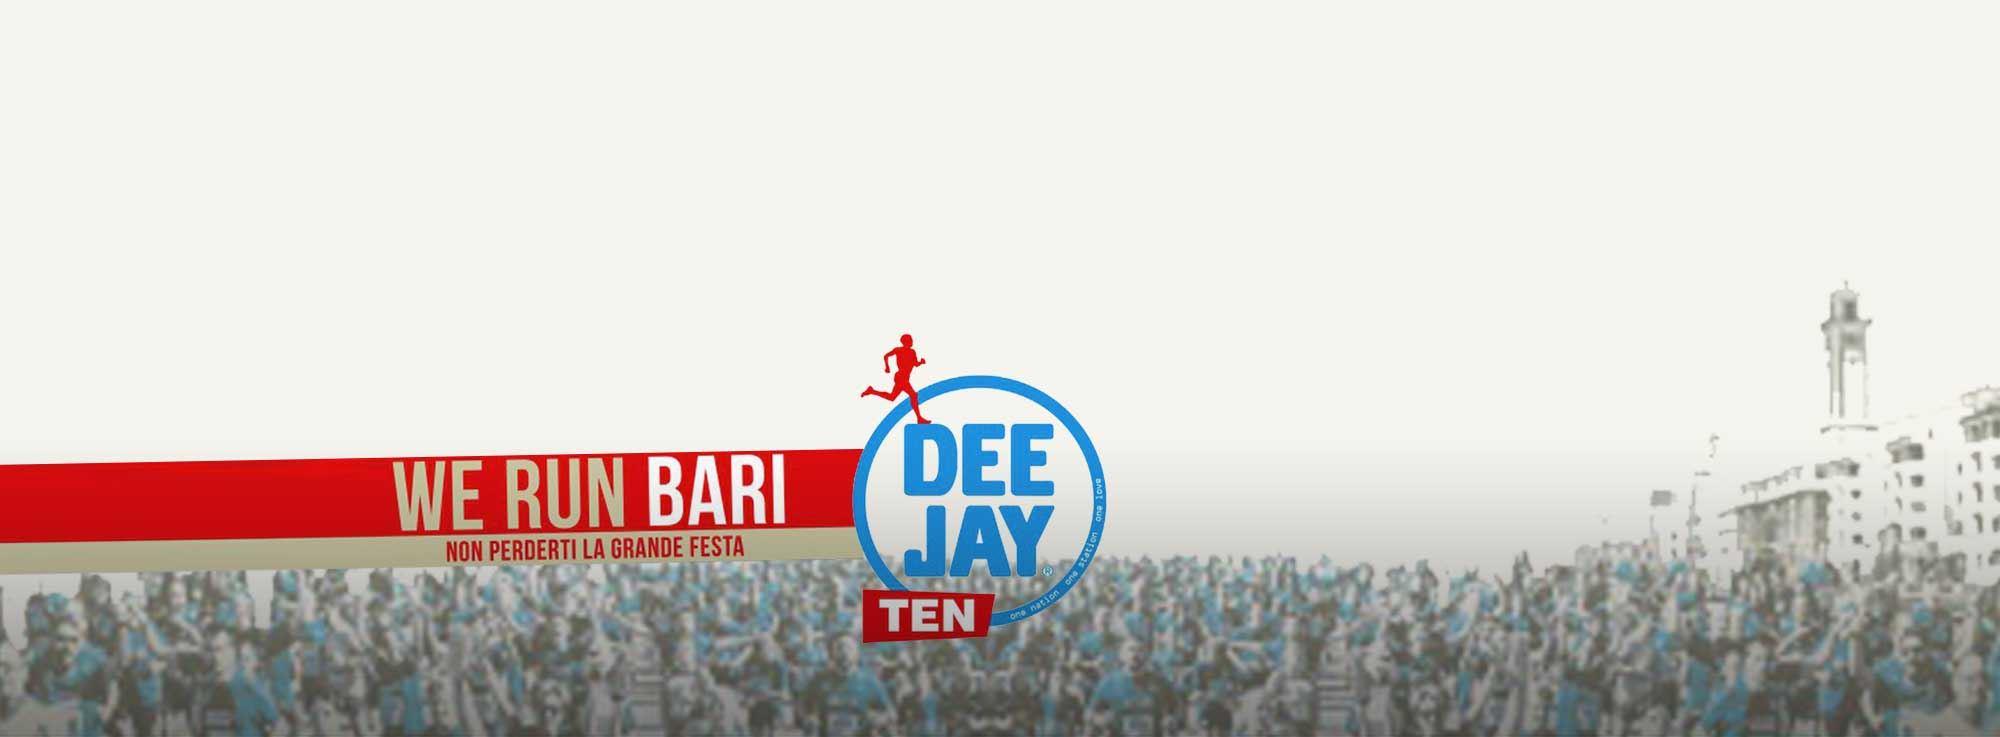 Bari: Deejay Ten 2016